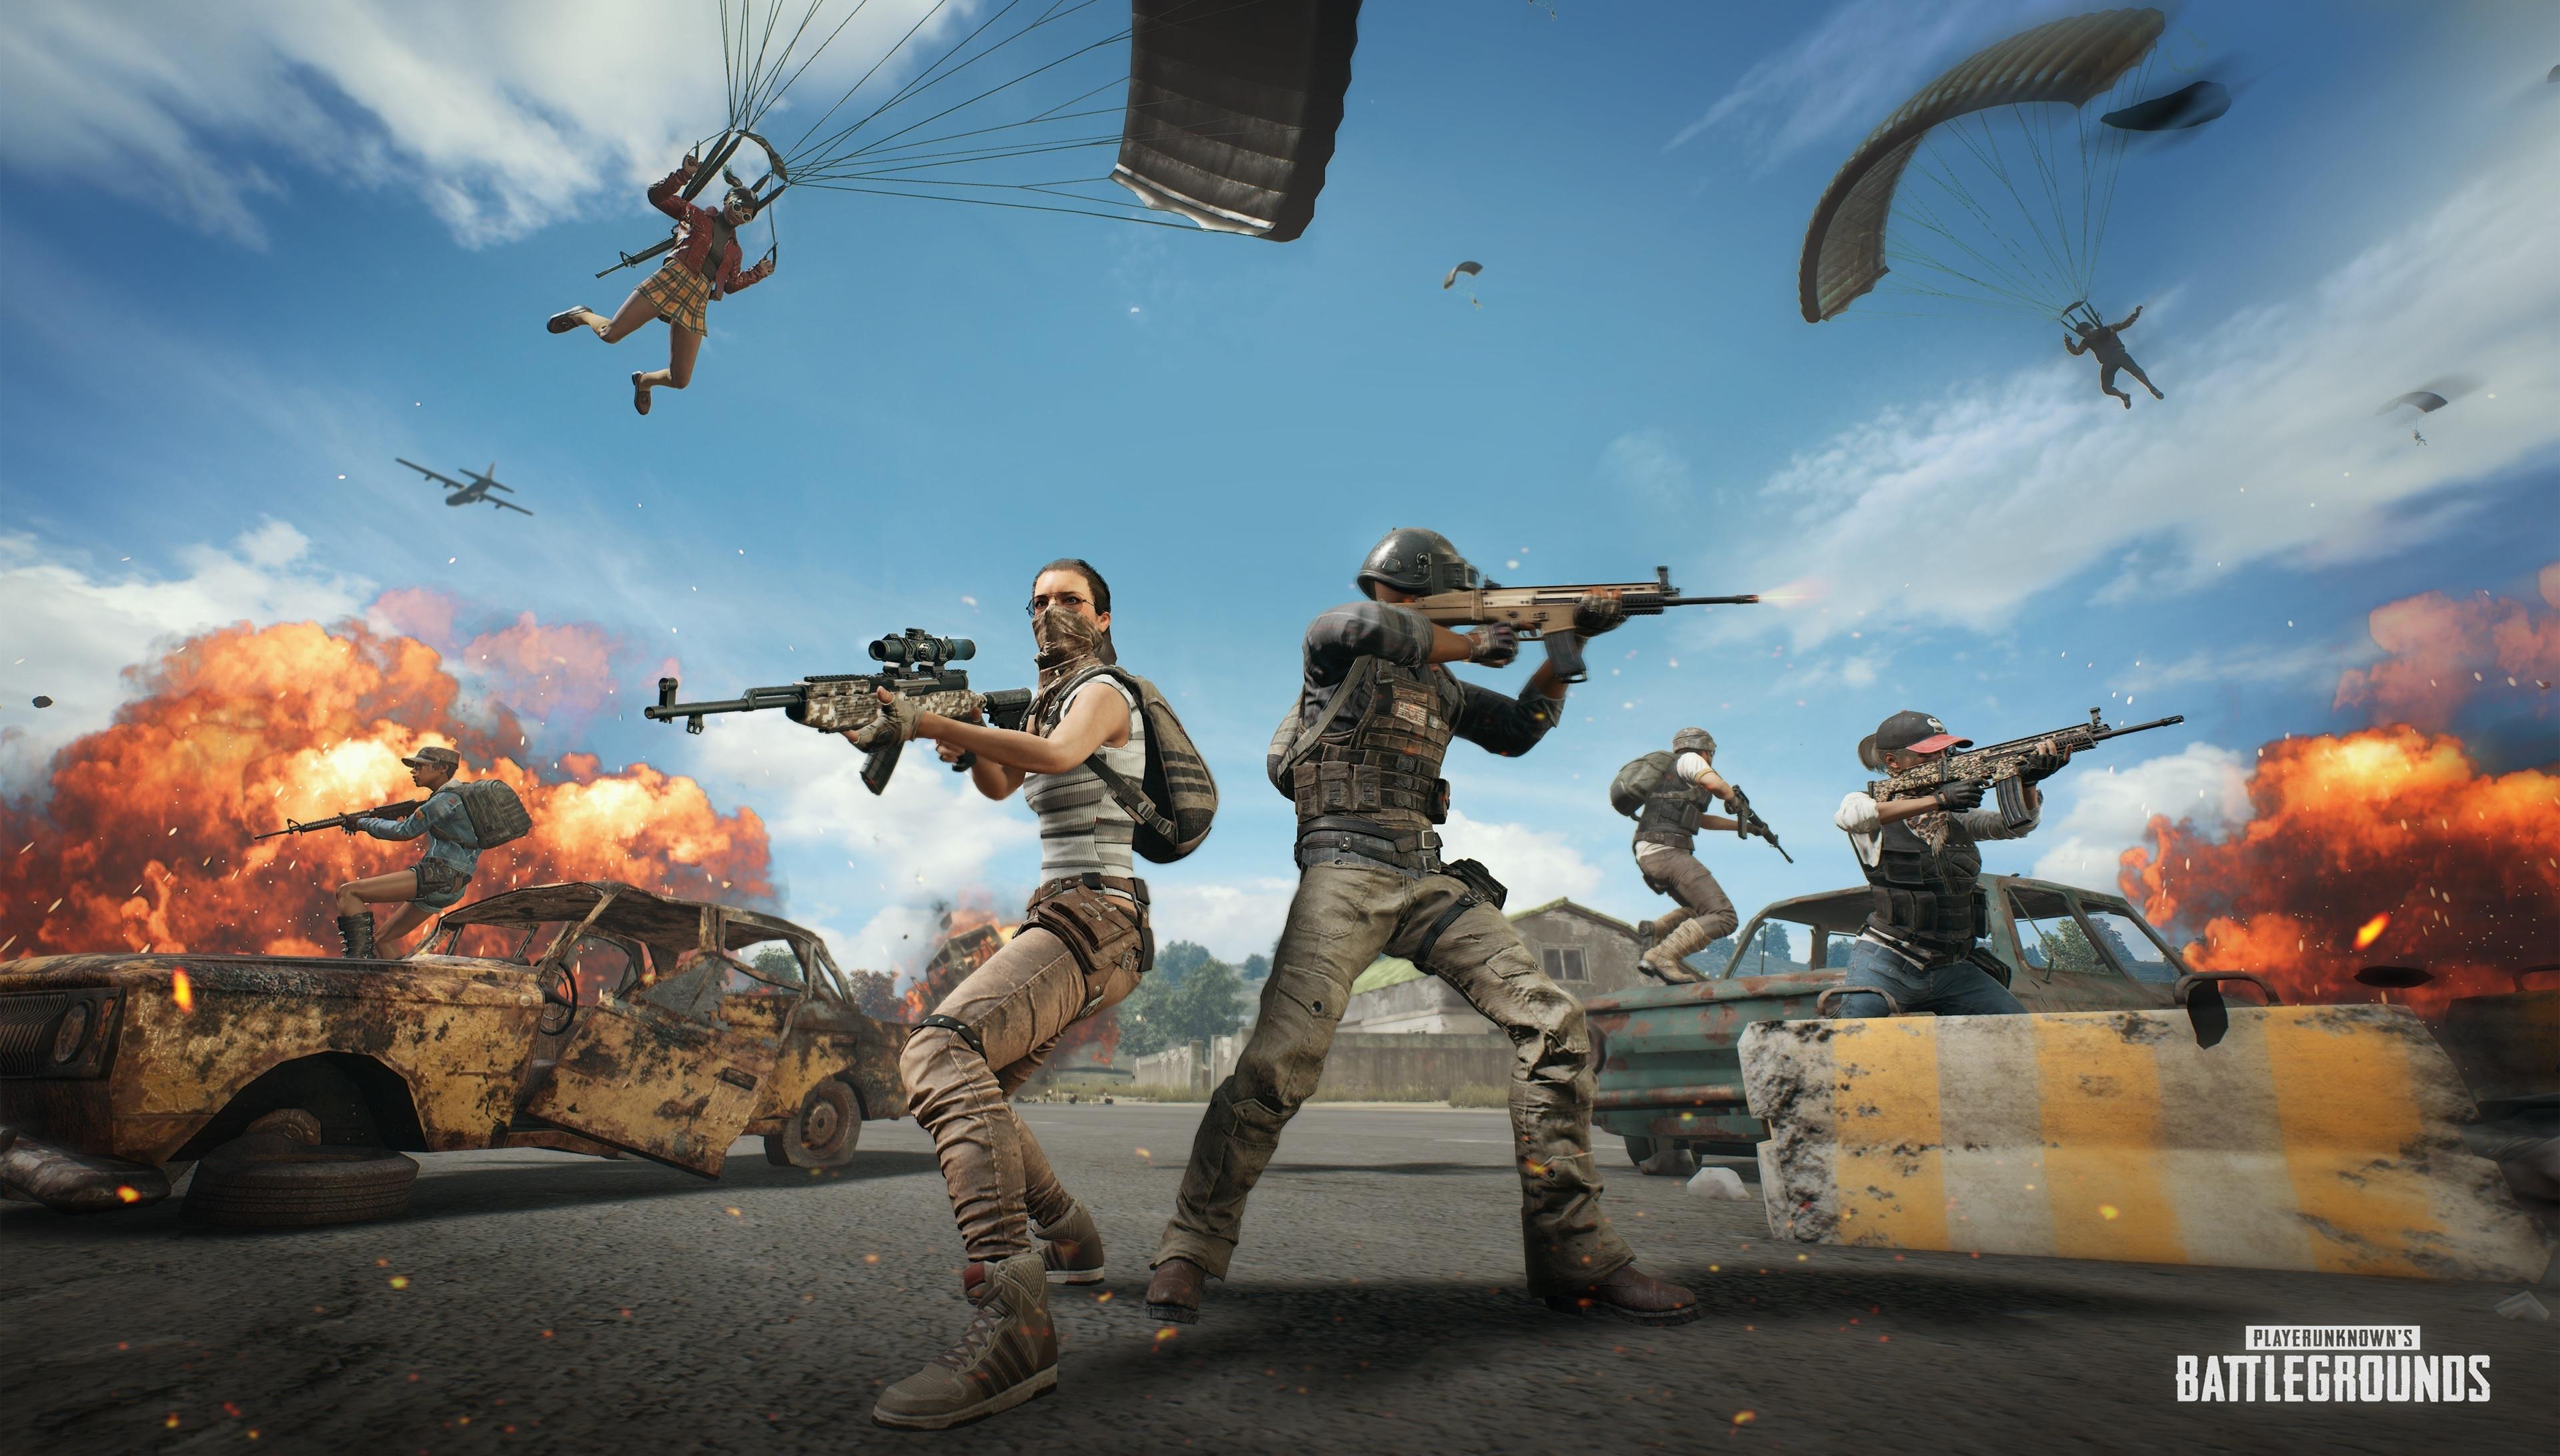 Download 3840x2400 Wallpaper Playerunknowns Battlegrounds Soldiers